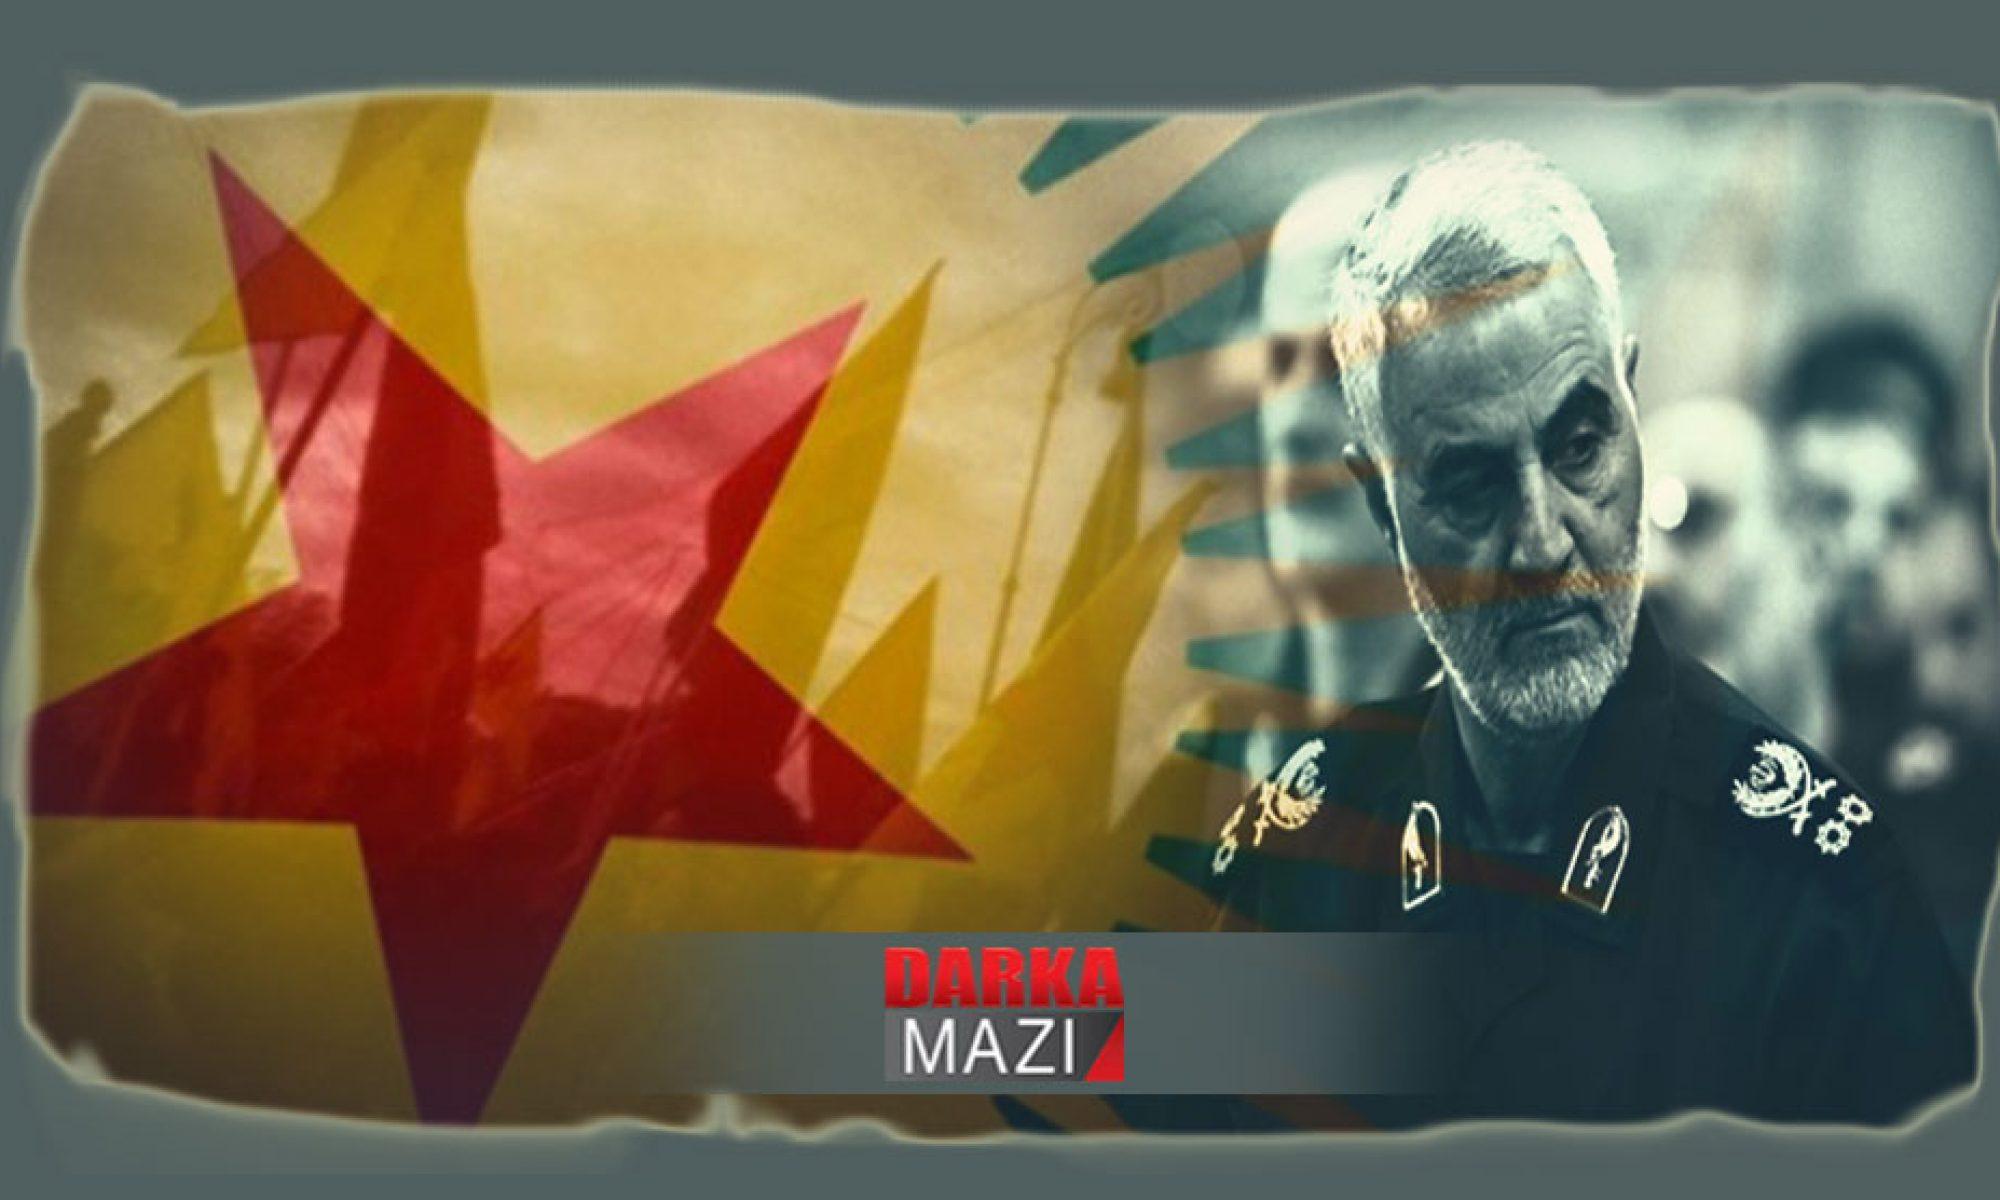 iran PKK Kasım Süleymani Kürdistan Şii Cephesi, Kasım Süleymani, Cemil Bayık; Kürdistan Bağımsızlık Referandumu